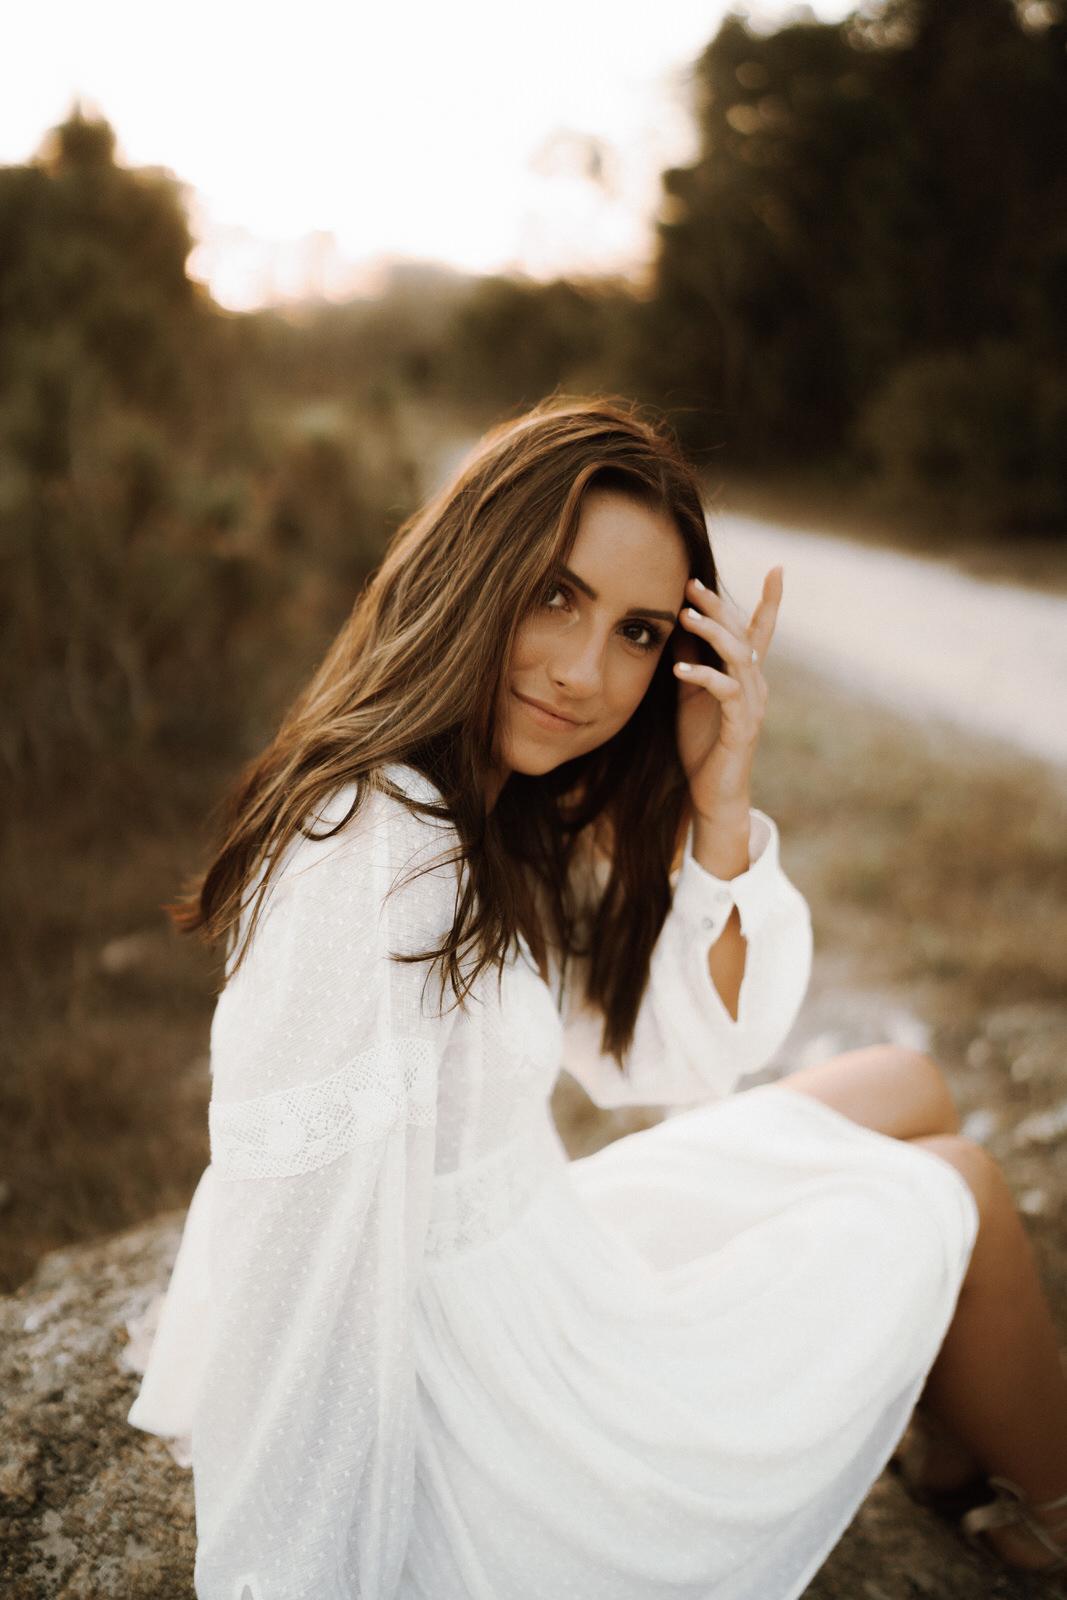 Fort Myers Senior Photos- Michelle Gonzalez Photography- Kate McQuagge-187.JPG